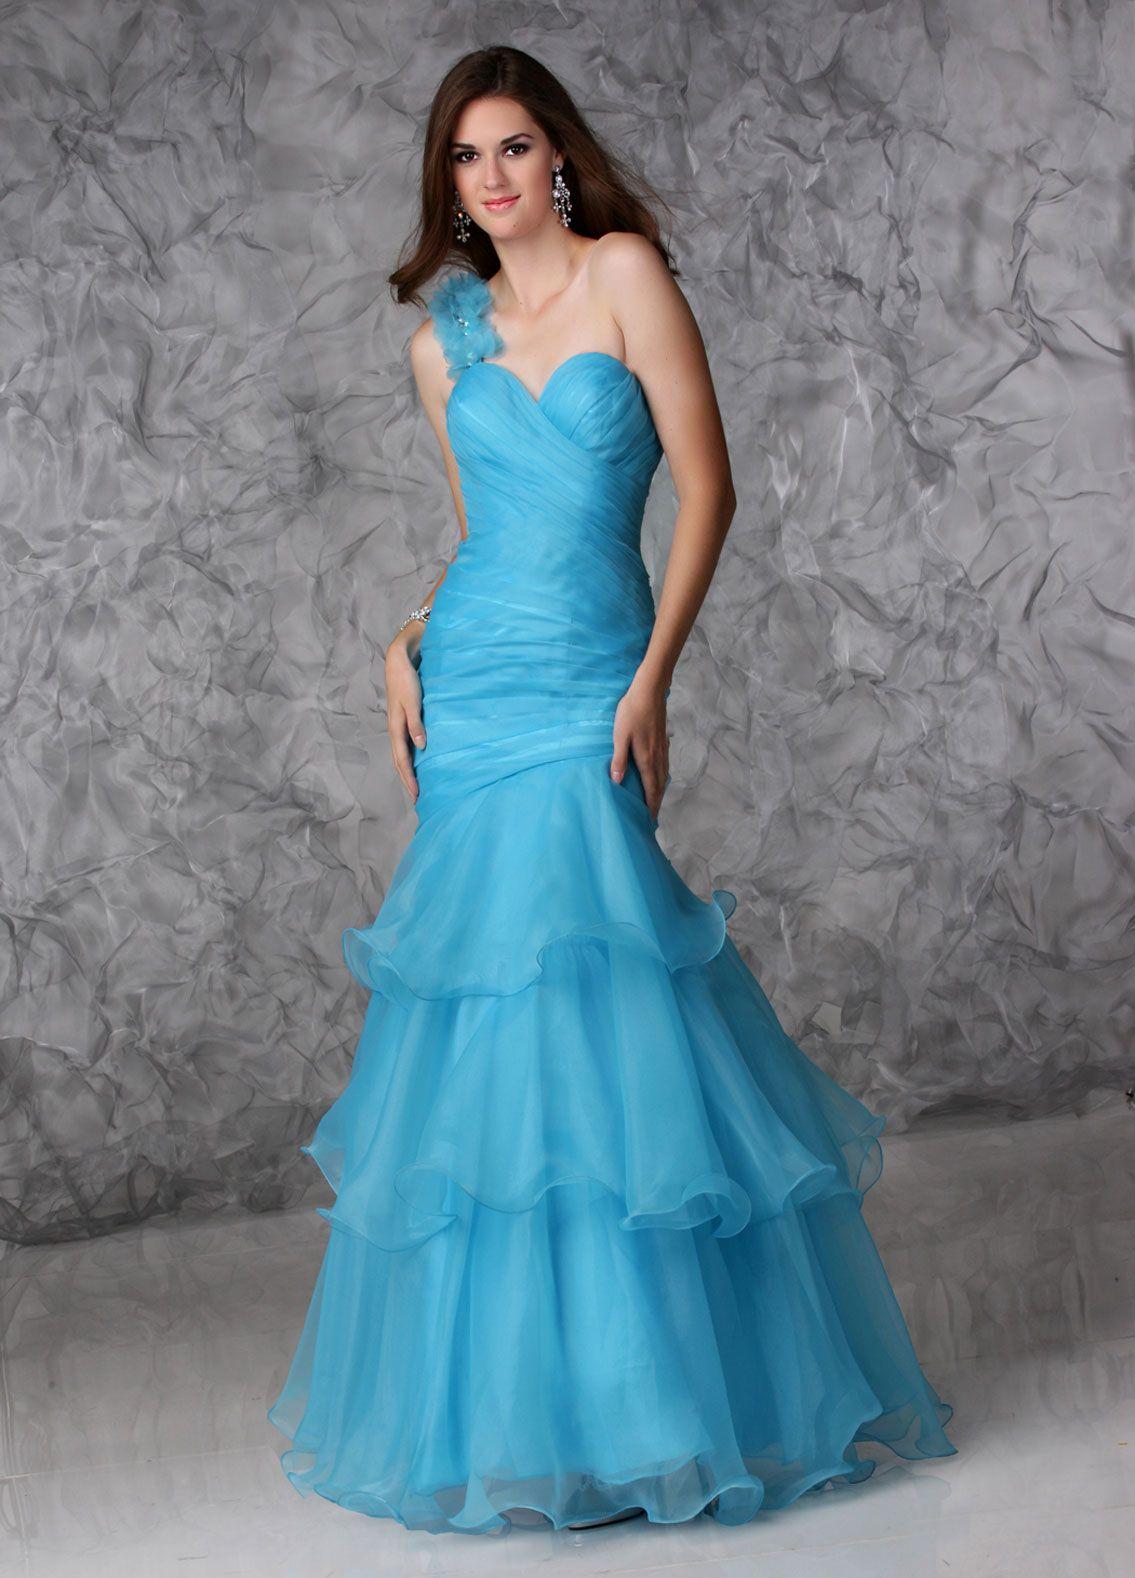 Impressions bridal prom dresses